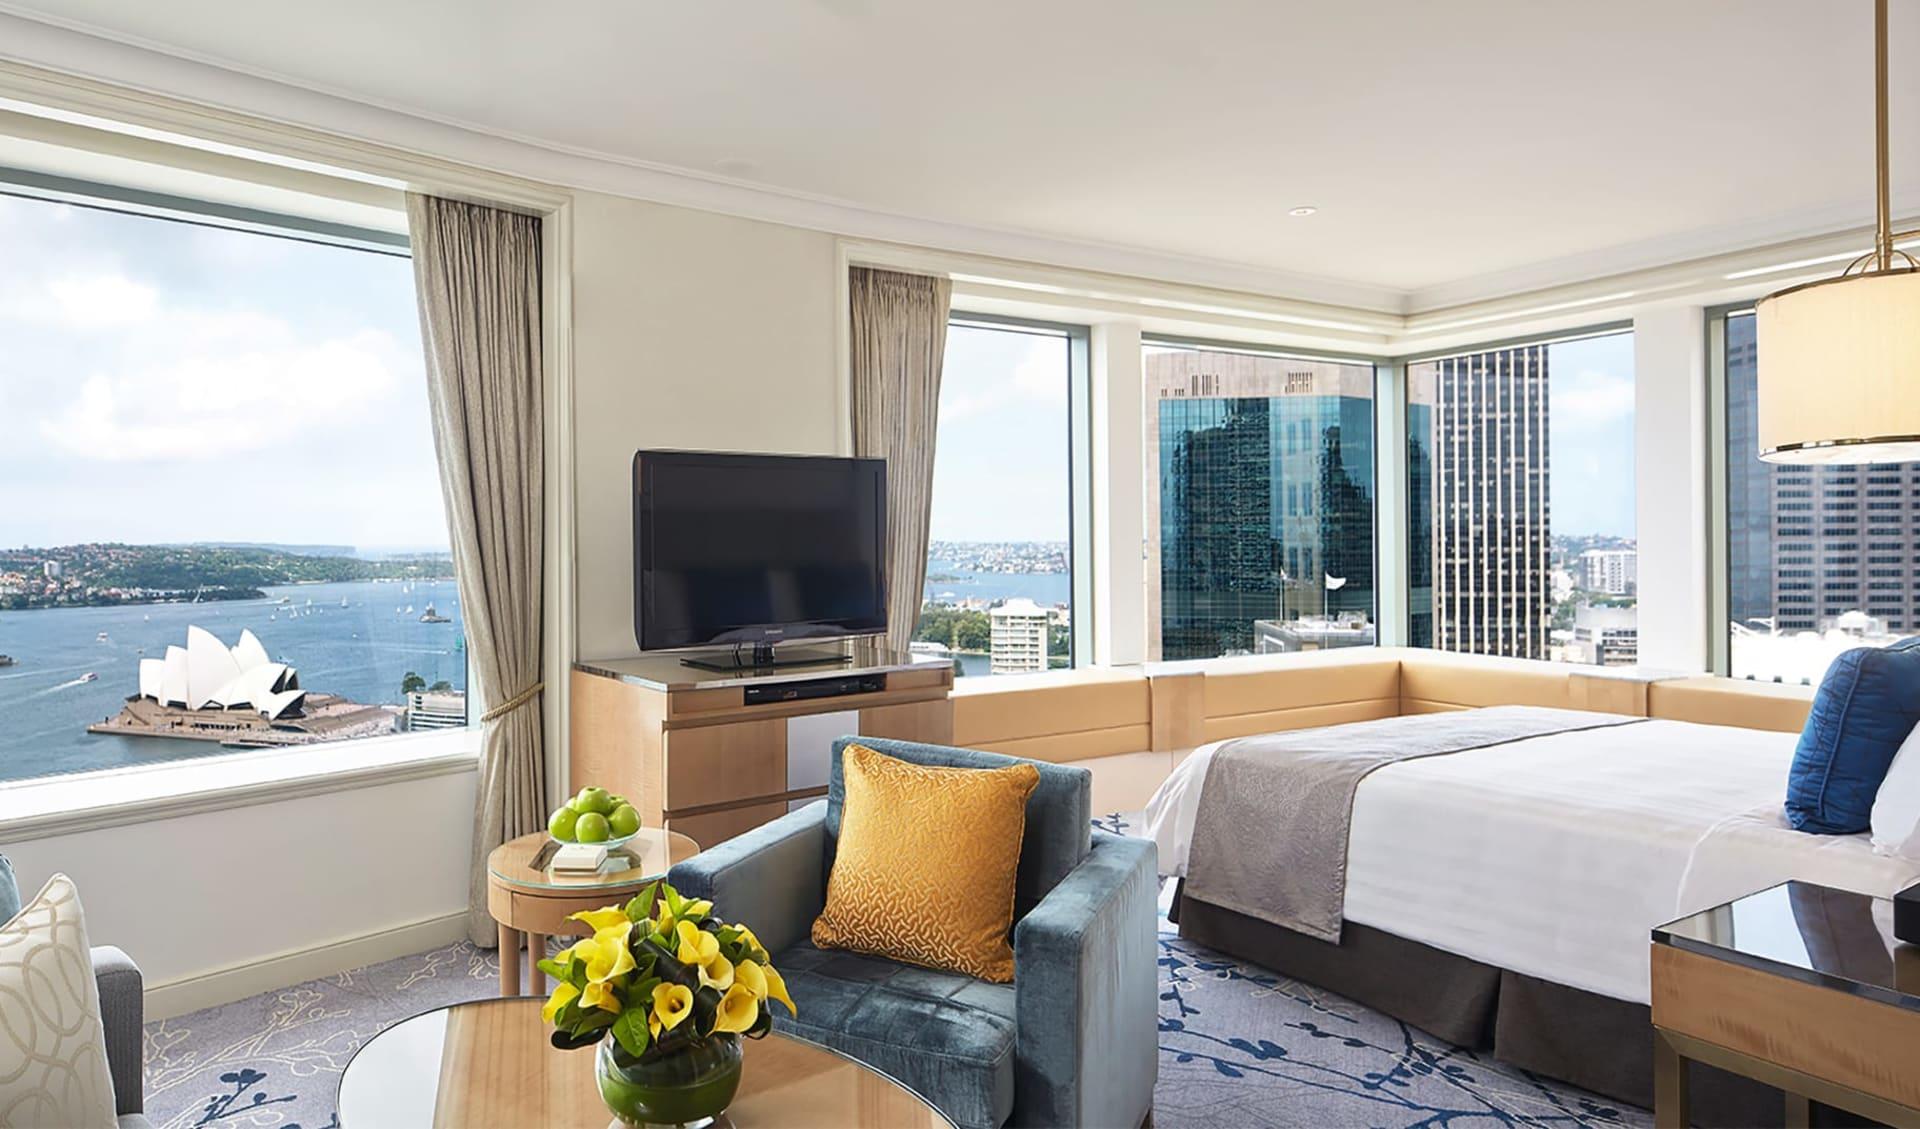 Shangri-La Sydney: Zimmer Shangri-La Hotel Sydney NSW Australien  Horizon Club Premier Grand Harbour Room 2017